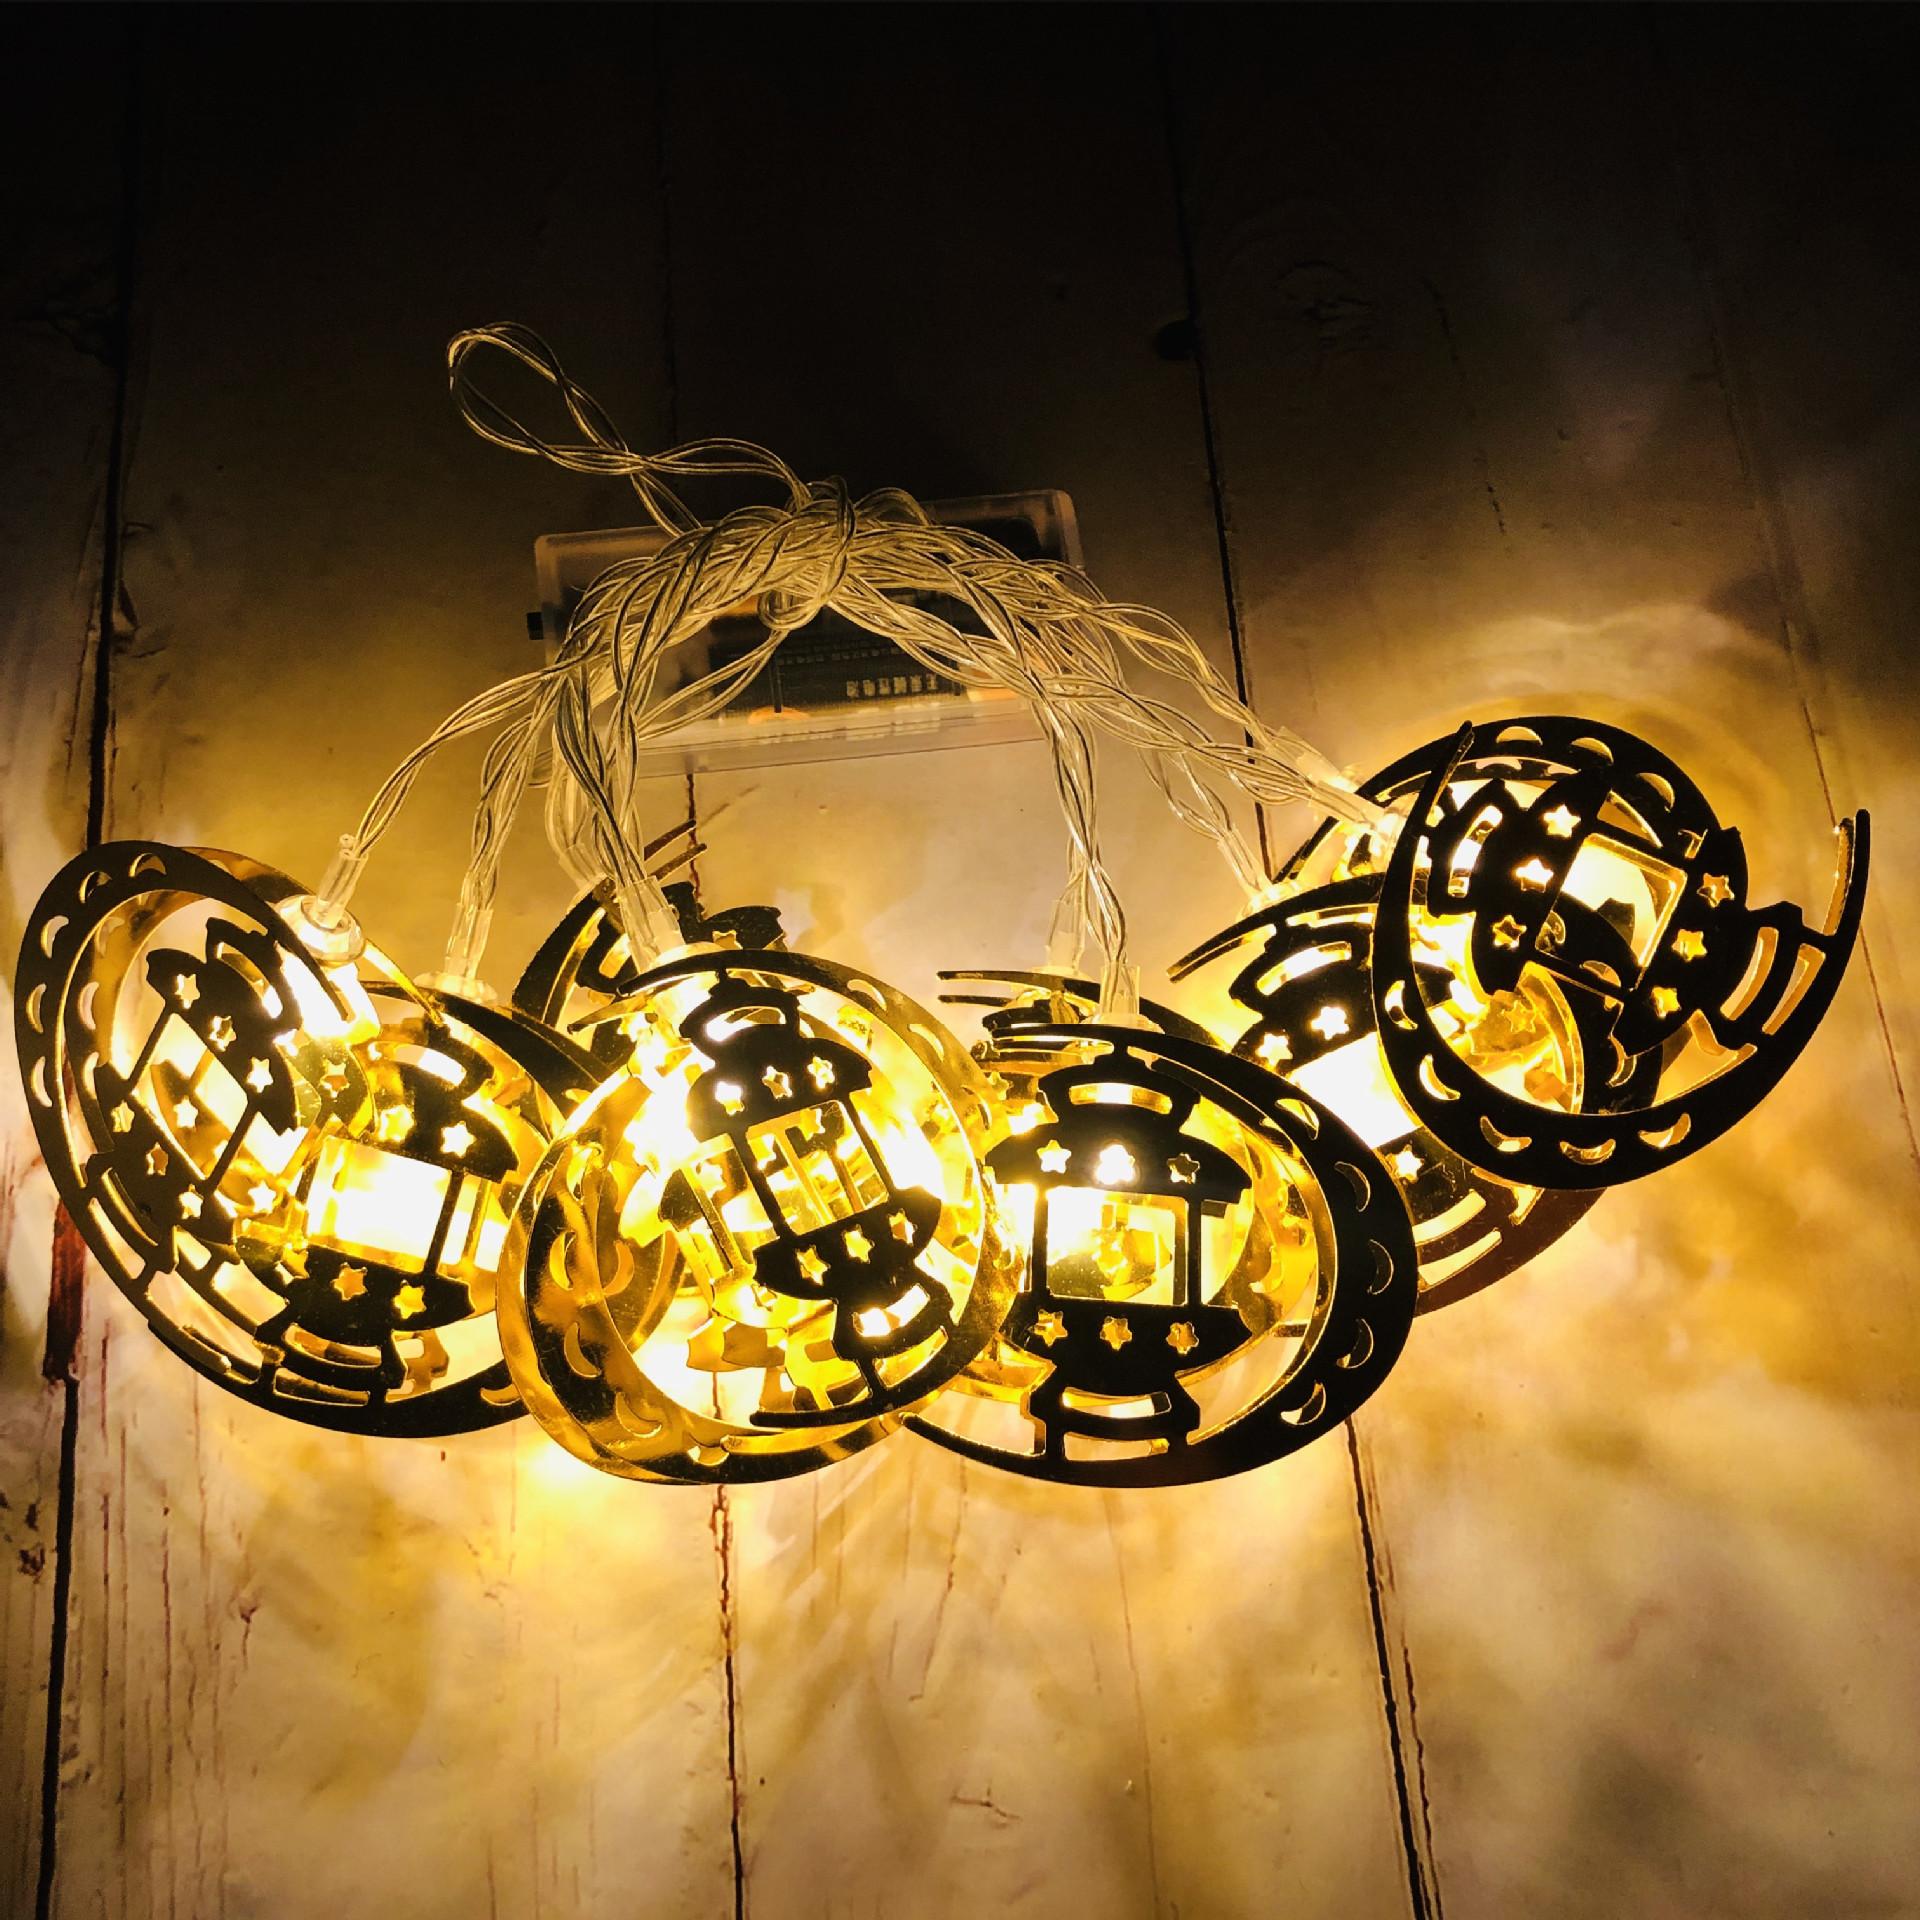 LED String Lights Ramadan Star Moon Party Eid Mubarak Ramadan Decorations Hanging Pendant Warm White